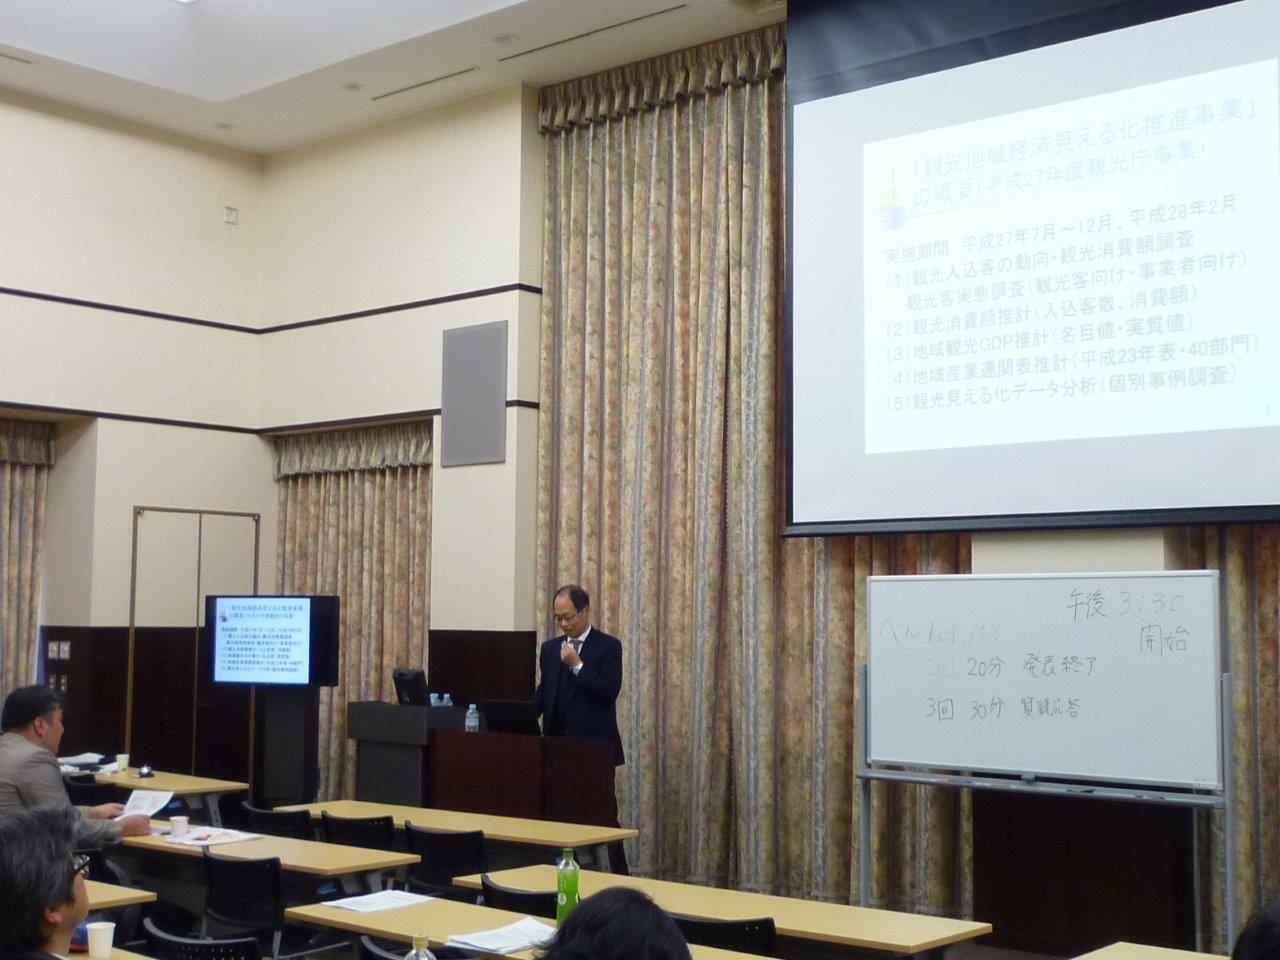 http://rcisss.ier.hit-u.ac.jp/Japanese/micro/information/about/micro/P1040289.jpg